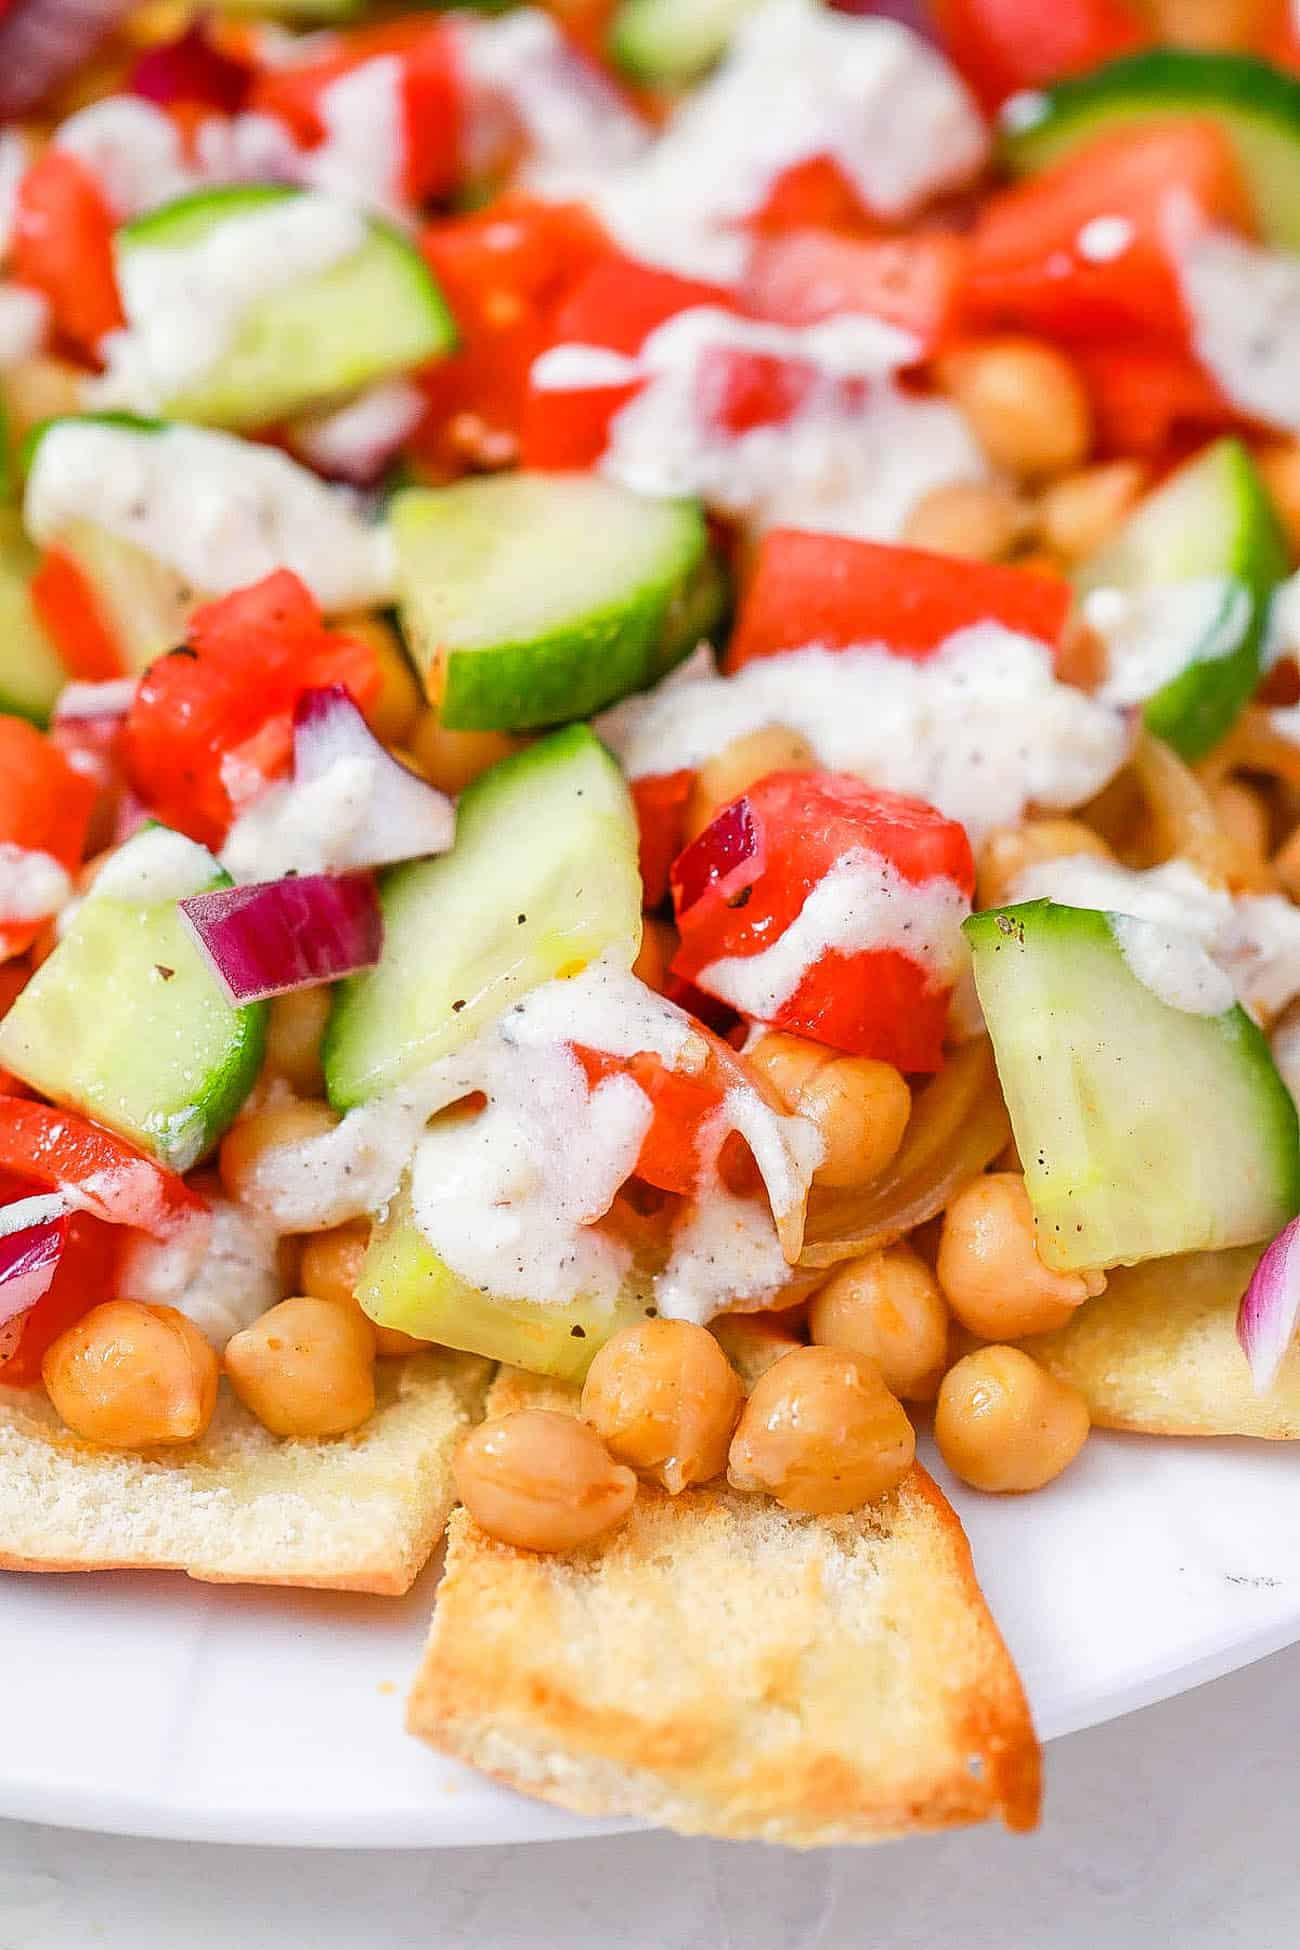 healthy vegetarian greek nachos served on a white plate